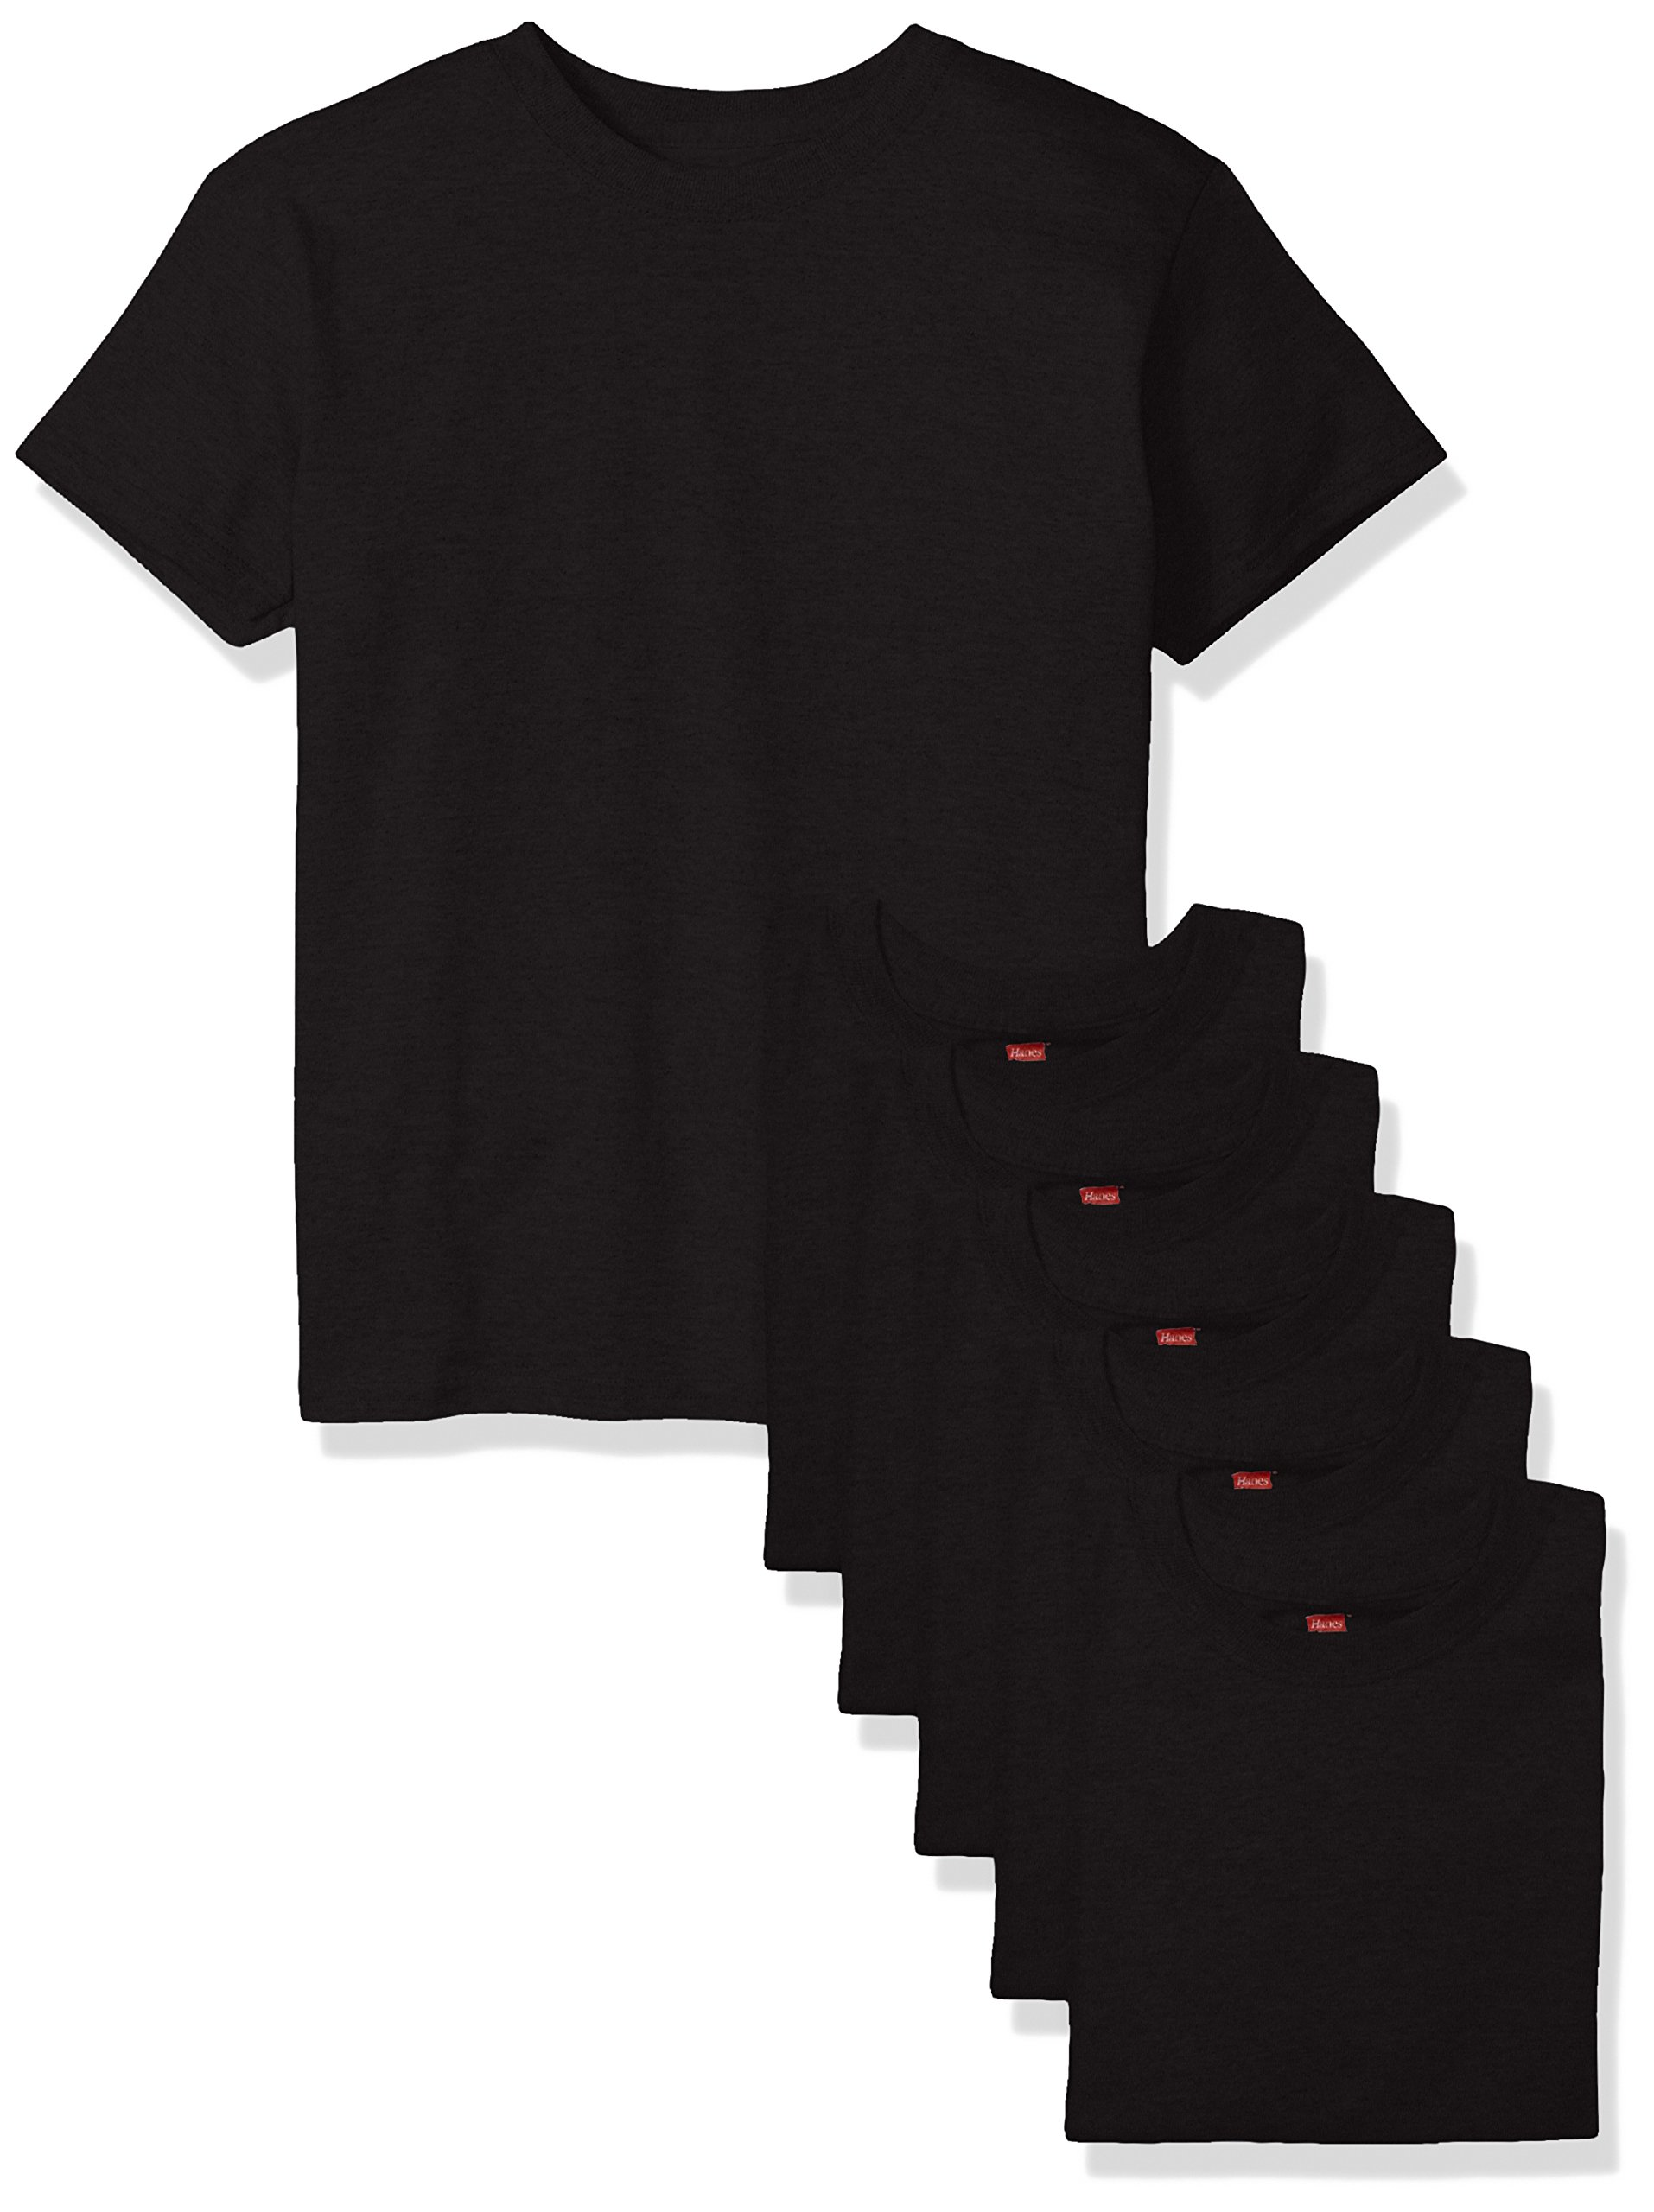 Hanes Big Boys' Comfortsoft T-Shirt (Pack of 6), Black, Medium